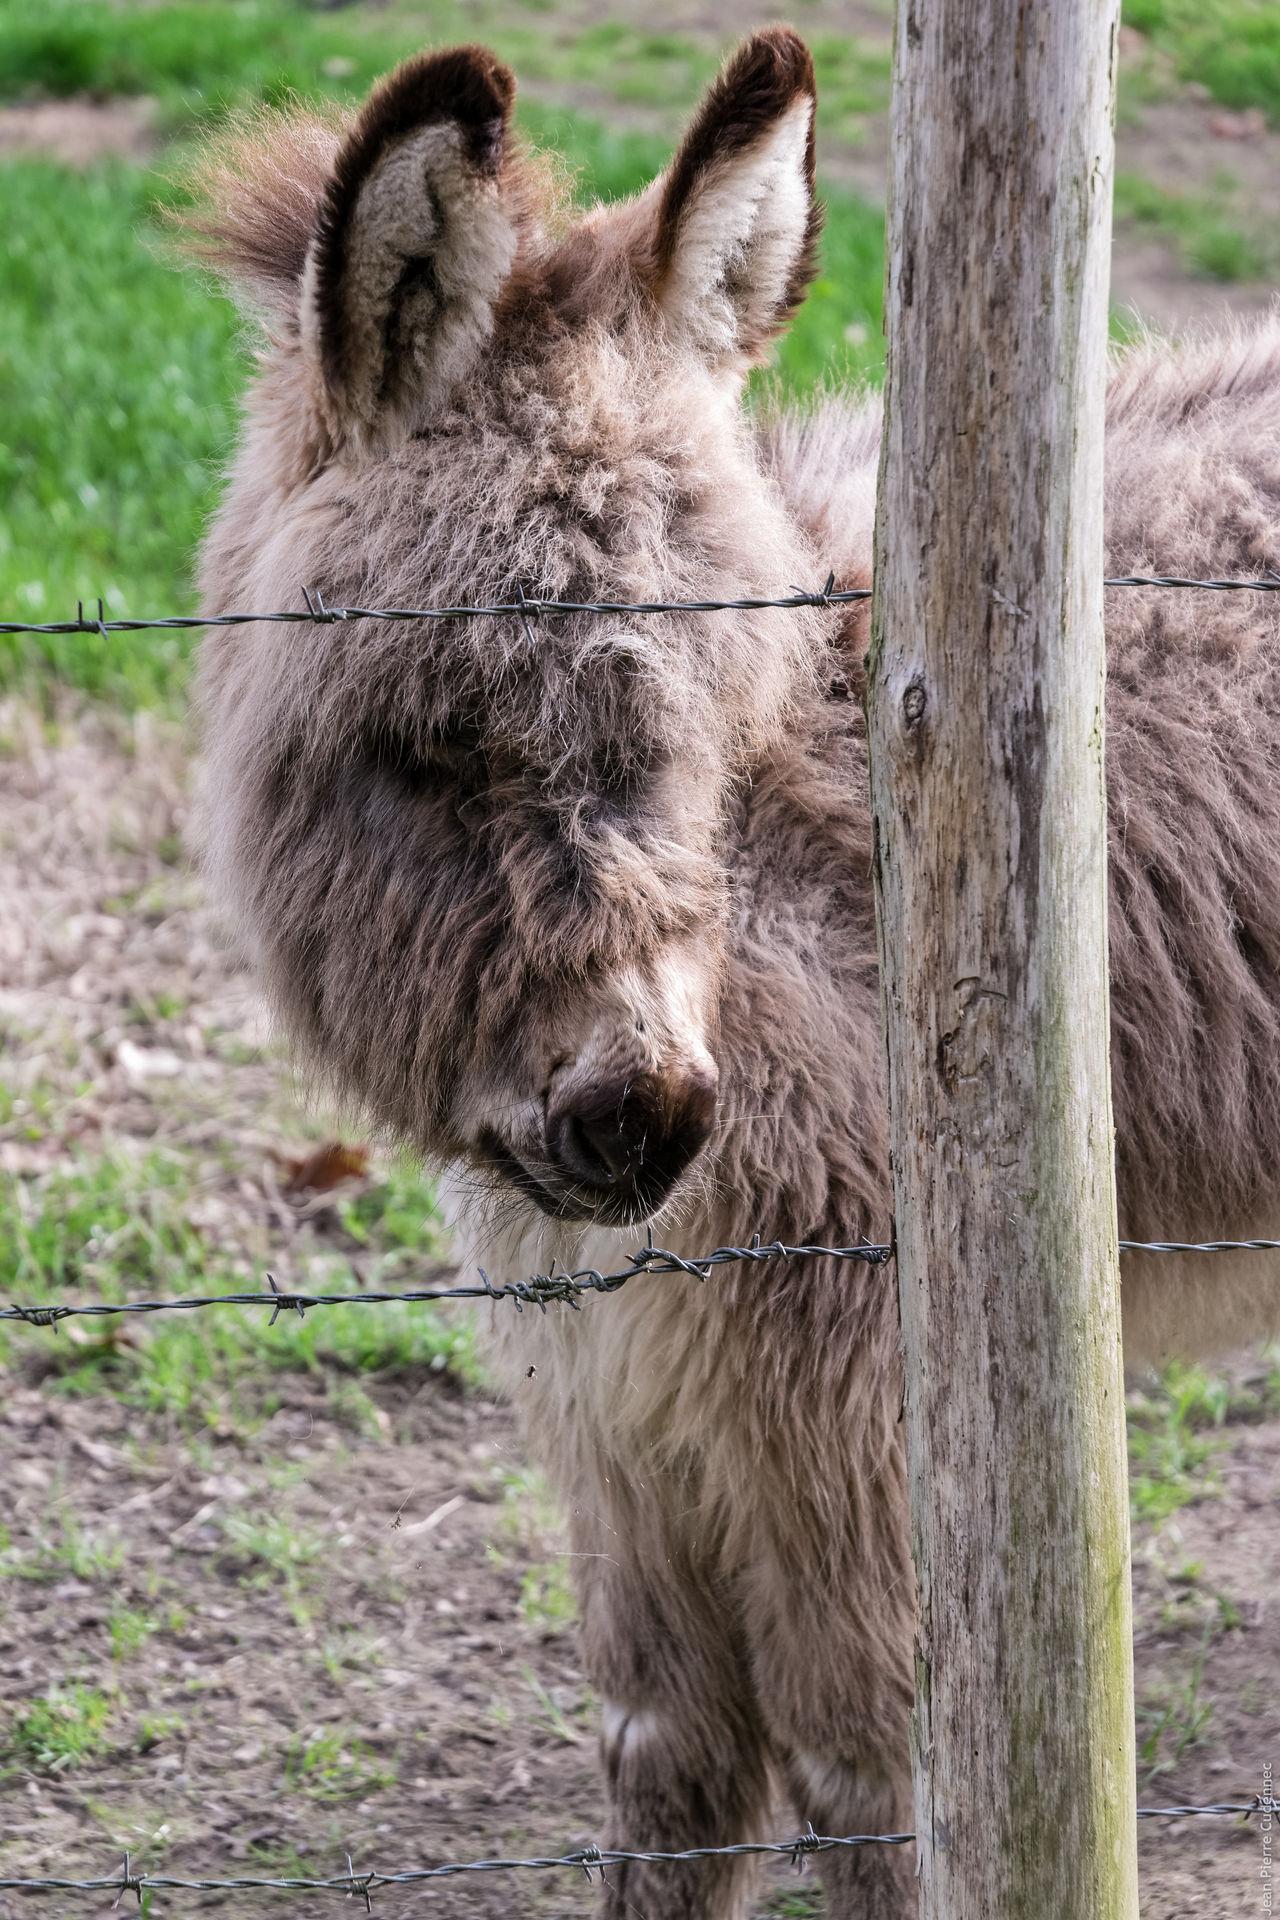 Ânon Animal Animal Themes Animals Baby Animals Close-up Donkey Fur Furry Mammal One Animal Young Animal